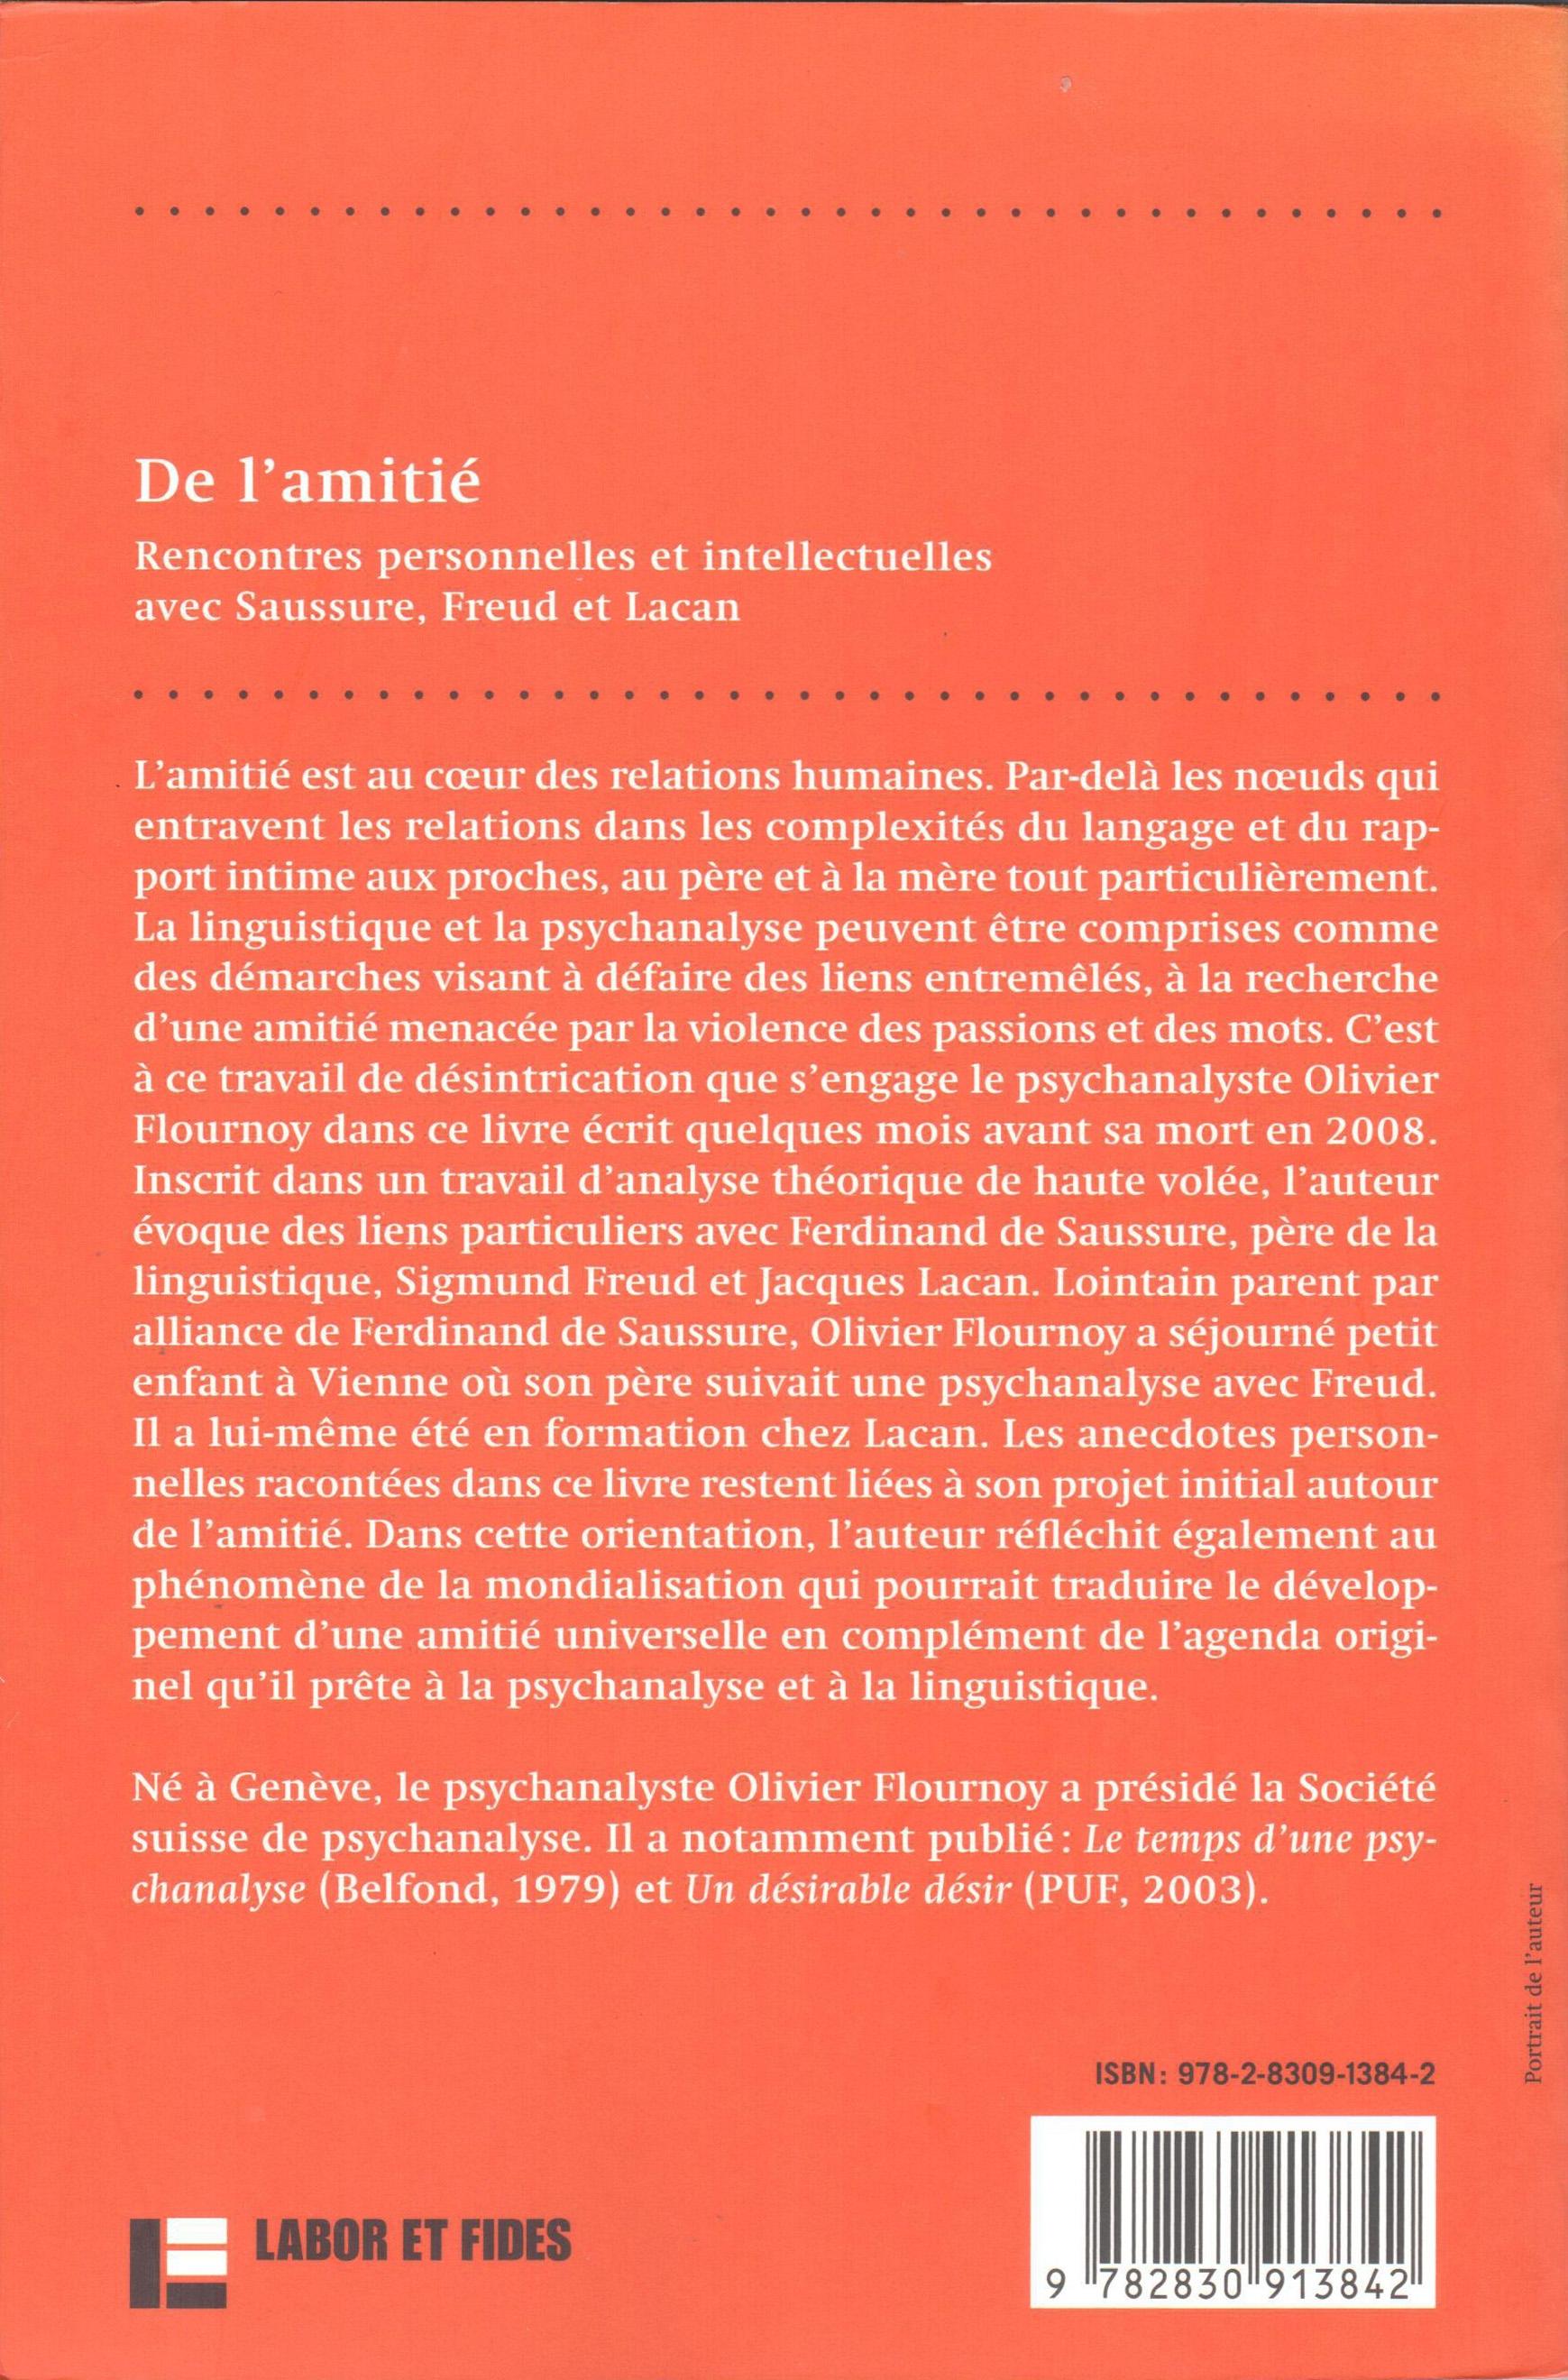 2010-De_l_amitie4eme